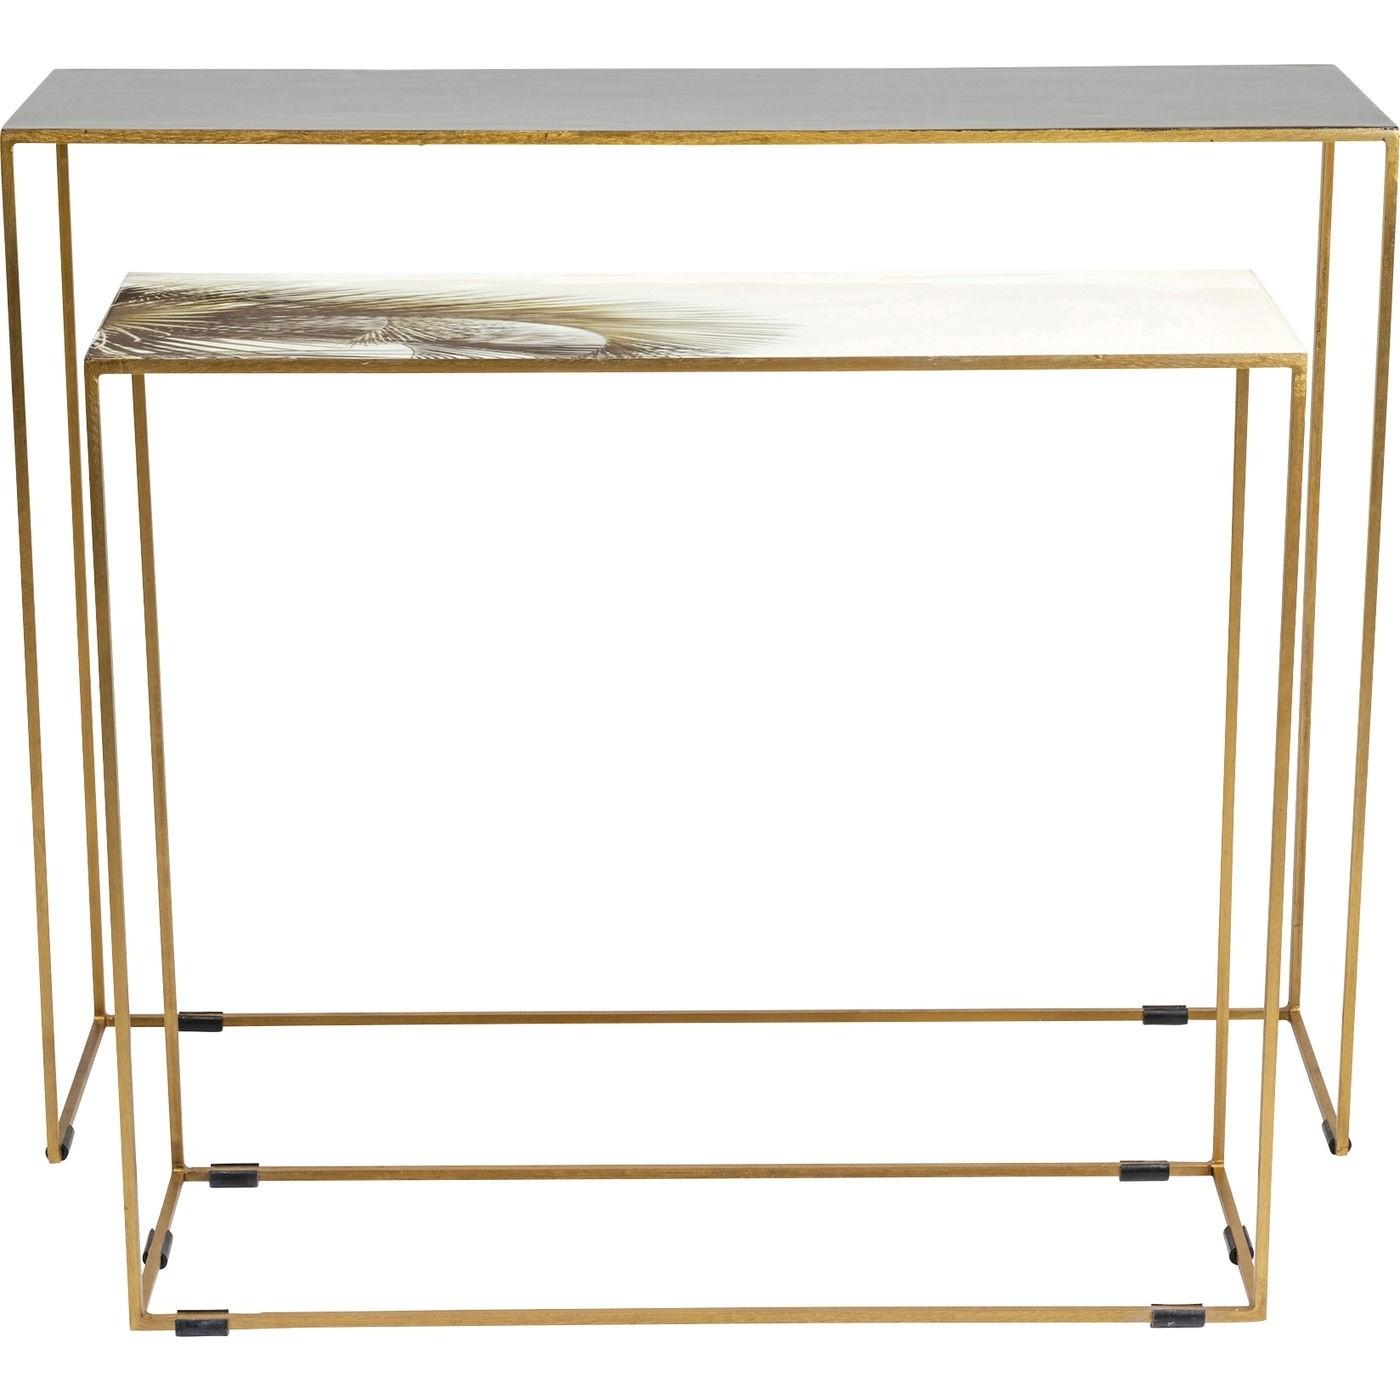 KARE DESIGN rektangulær Charme konsolbord - emalje og messing stål (sæt á 2)